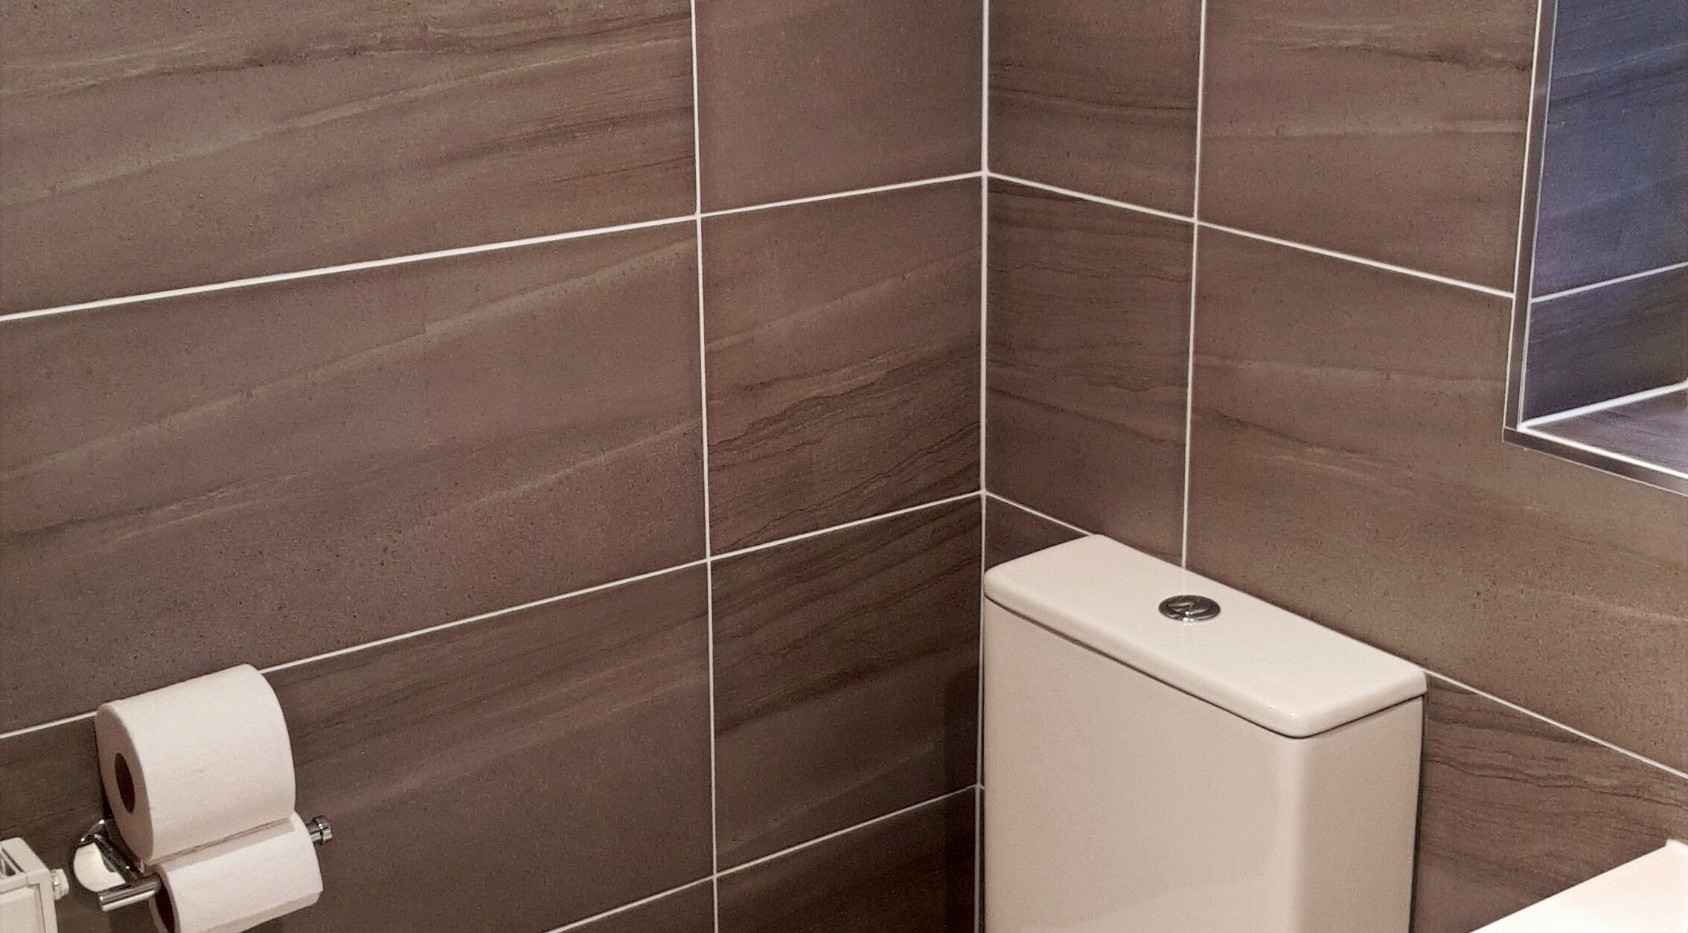 Bathroom toilet tiling flooring